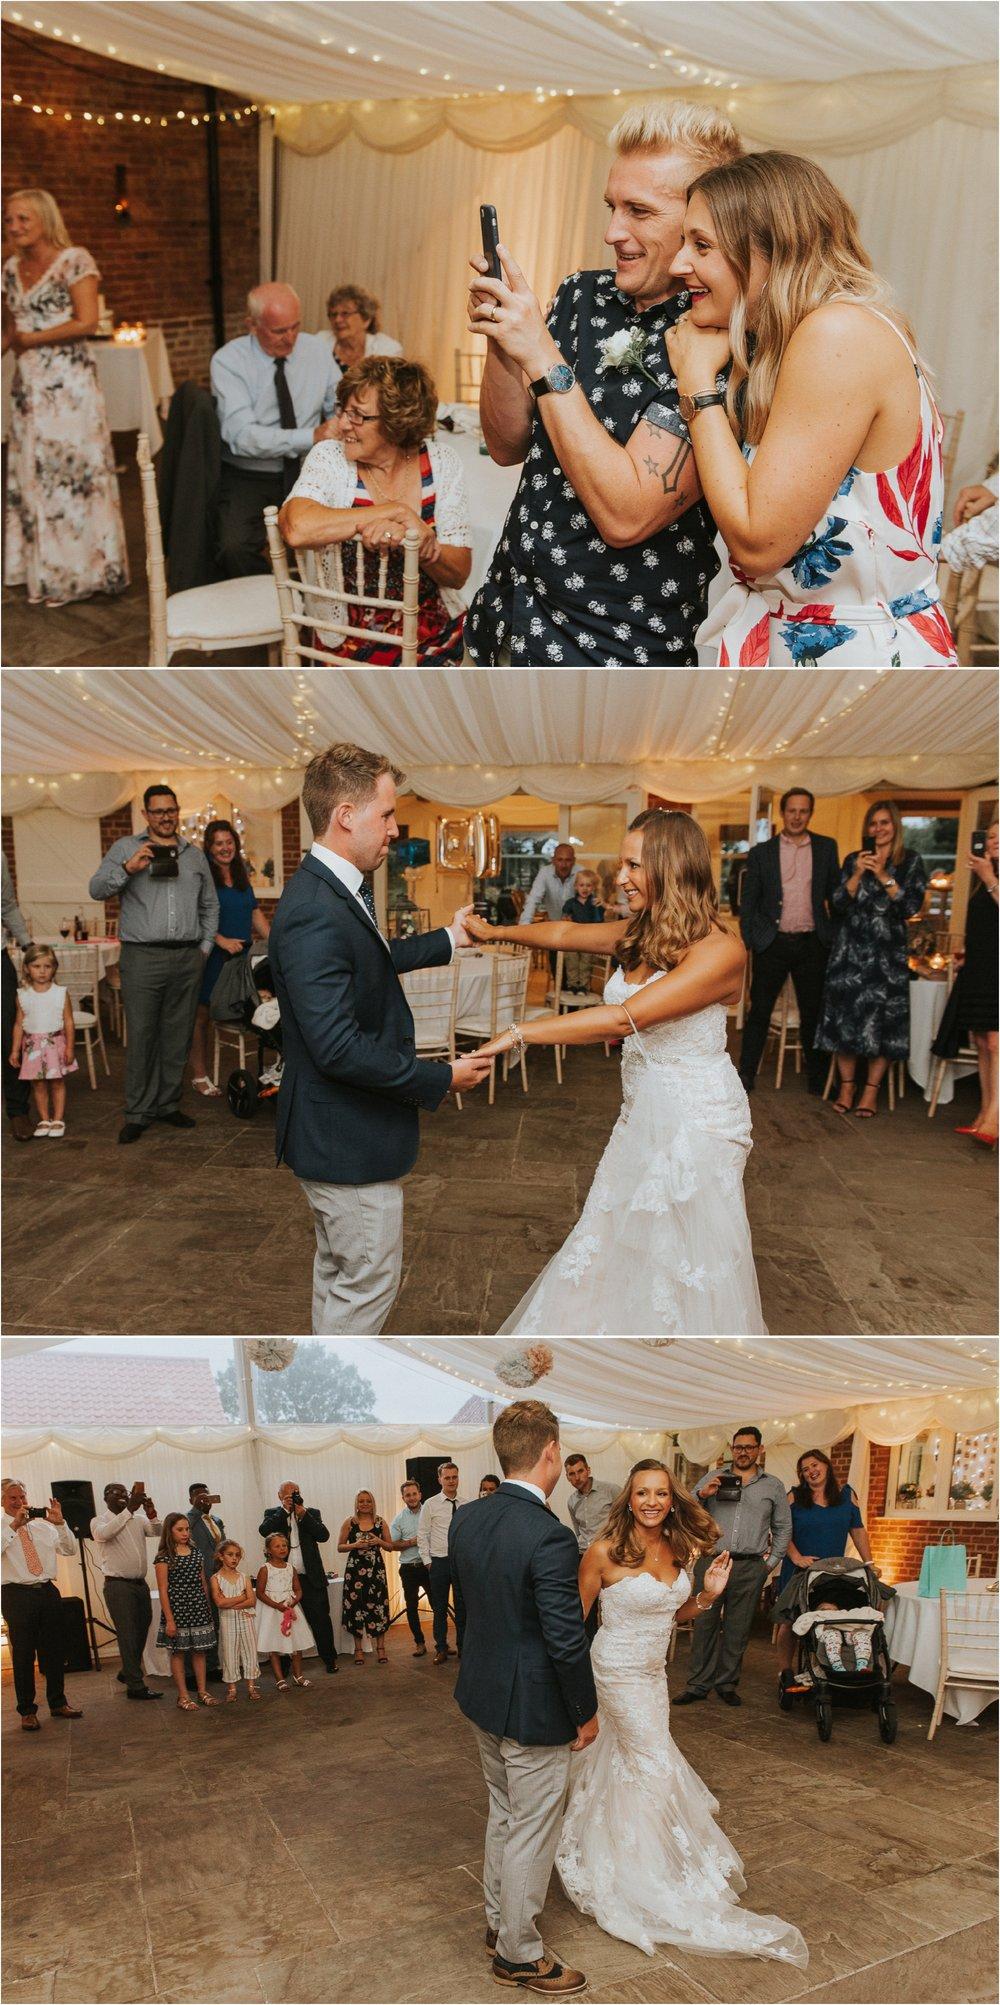 PheasantBrewery-LukeHolroyd-Yorkshirewedding_000205.jpg